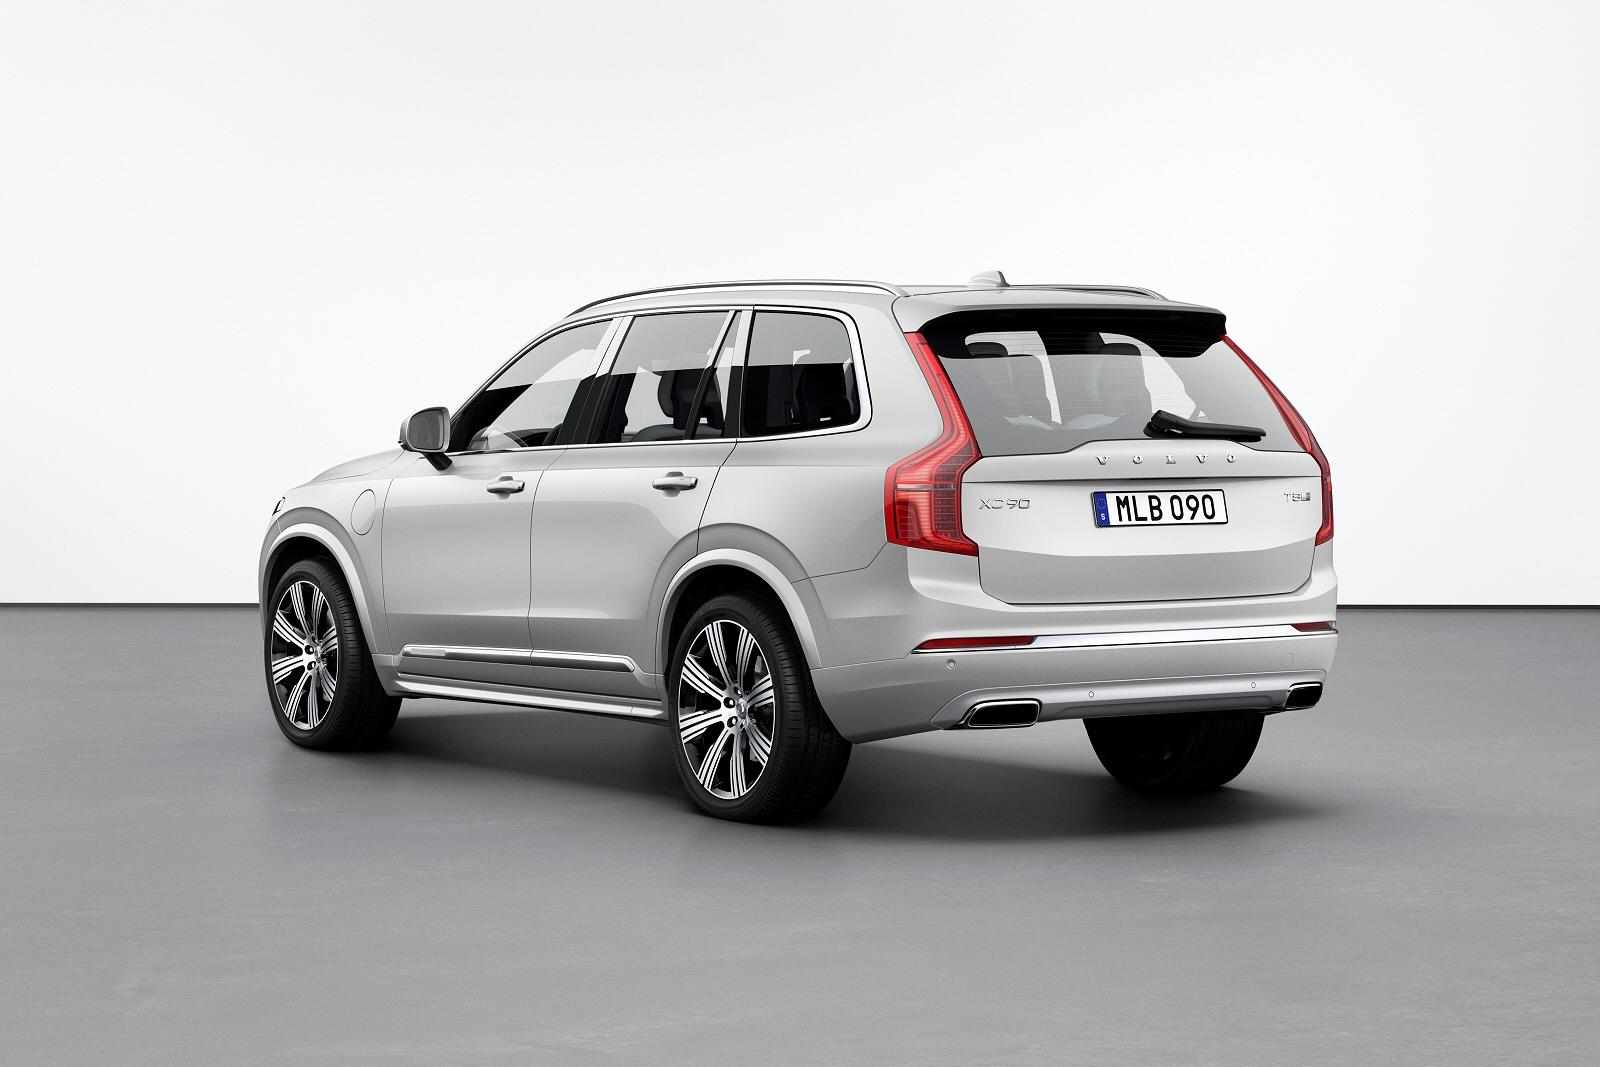 New Volvo Xc90 >> New Volvo Xc90 2 0 T8 390 Hybrid R Design Pro 5dr Awd Gtron Estate